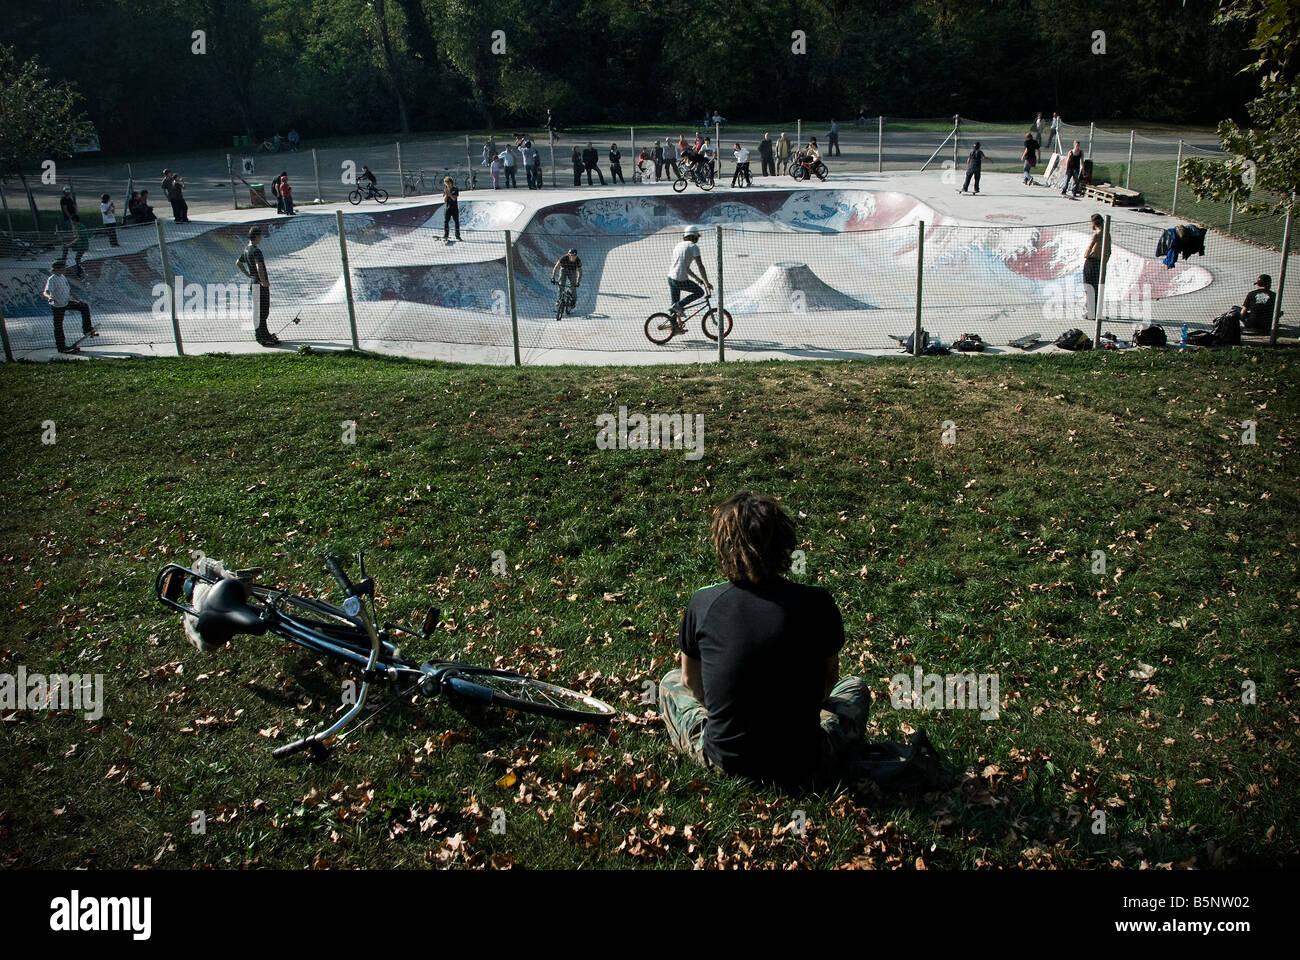 Skate park. - Stock Image